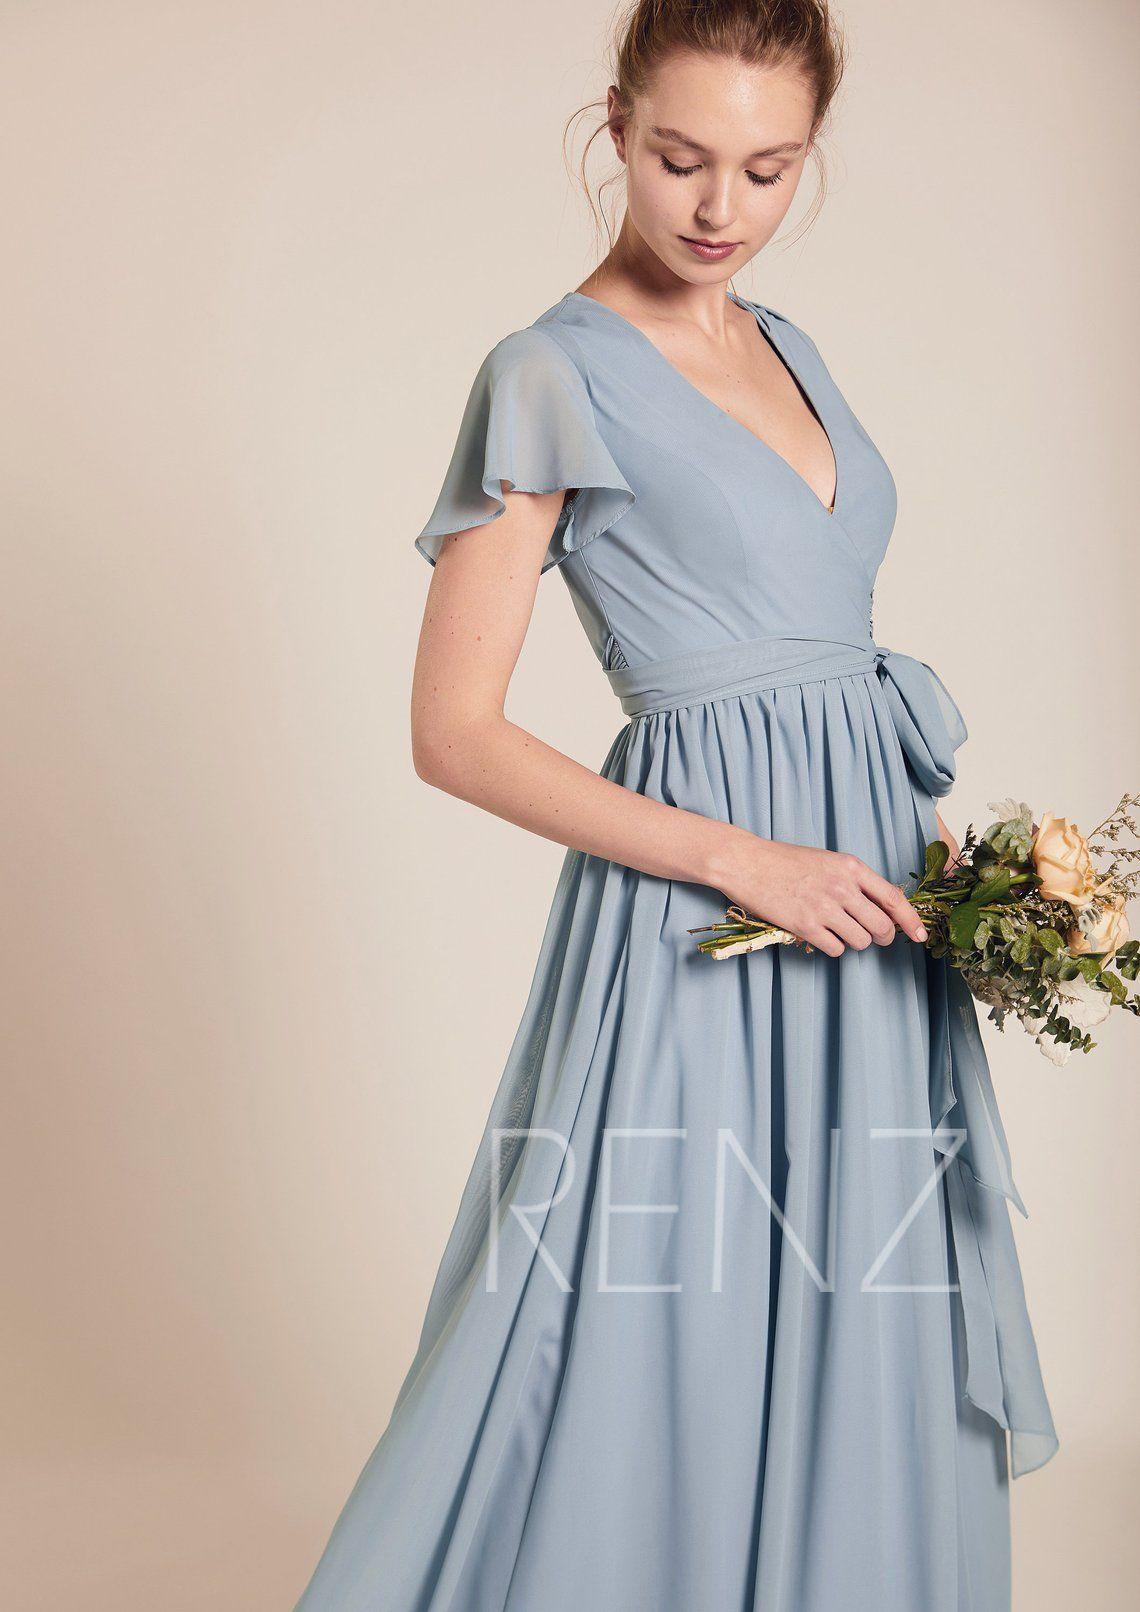 70e80407d3 Bridesmaid Dress Dusty Blue Chiffon DressWedding DressV Neck